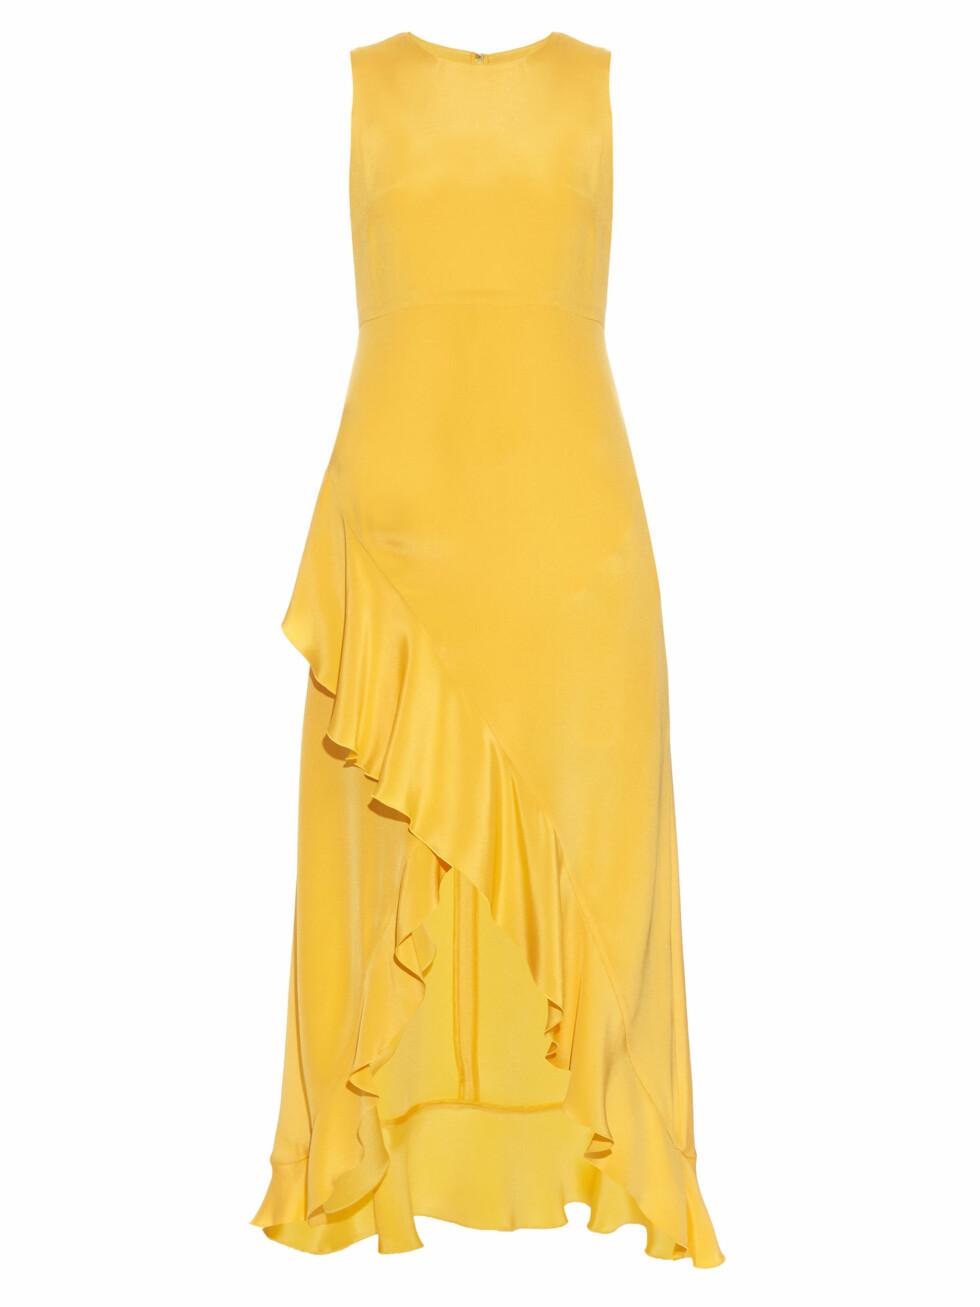 Kjole fra Raey via Matchesfashion.com | kr 1540 | http://www.matchesfashion.com/intl/products/Raey-Ruffled-silk-midi-dress-1069494